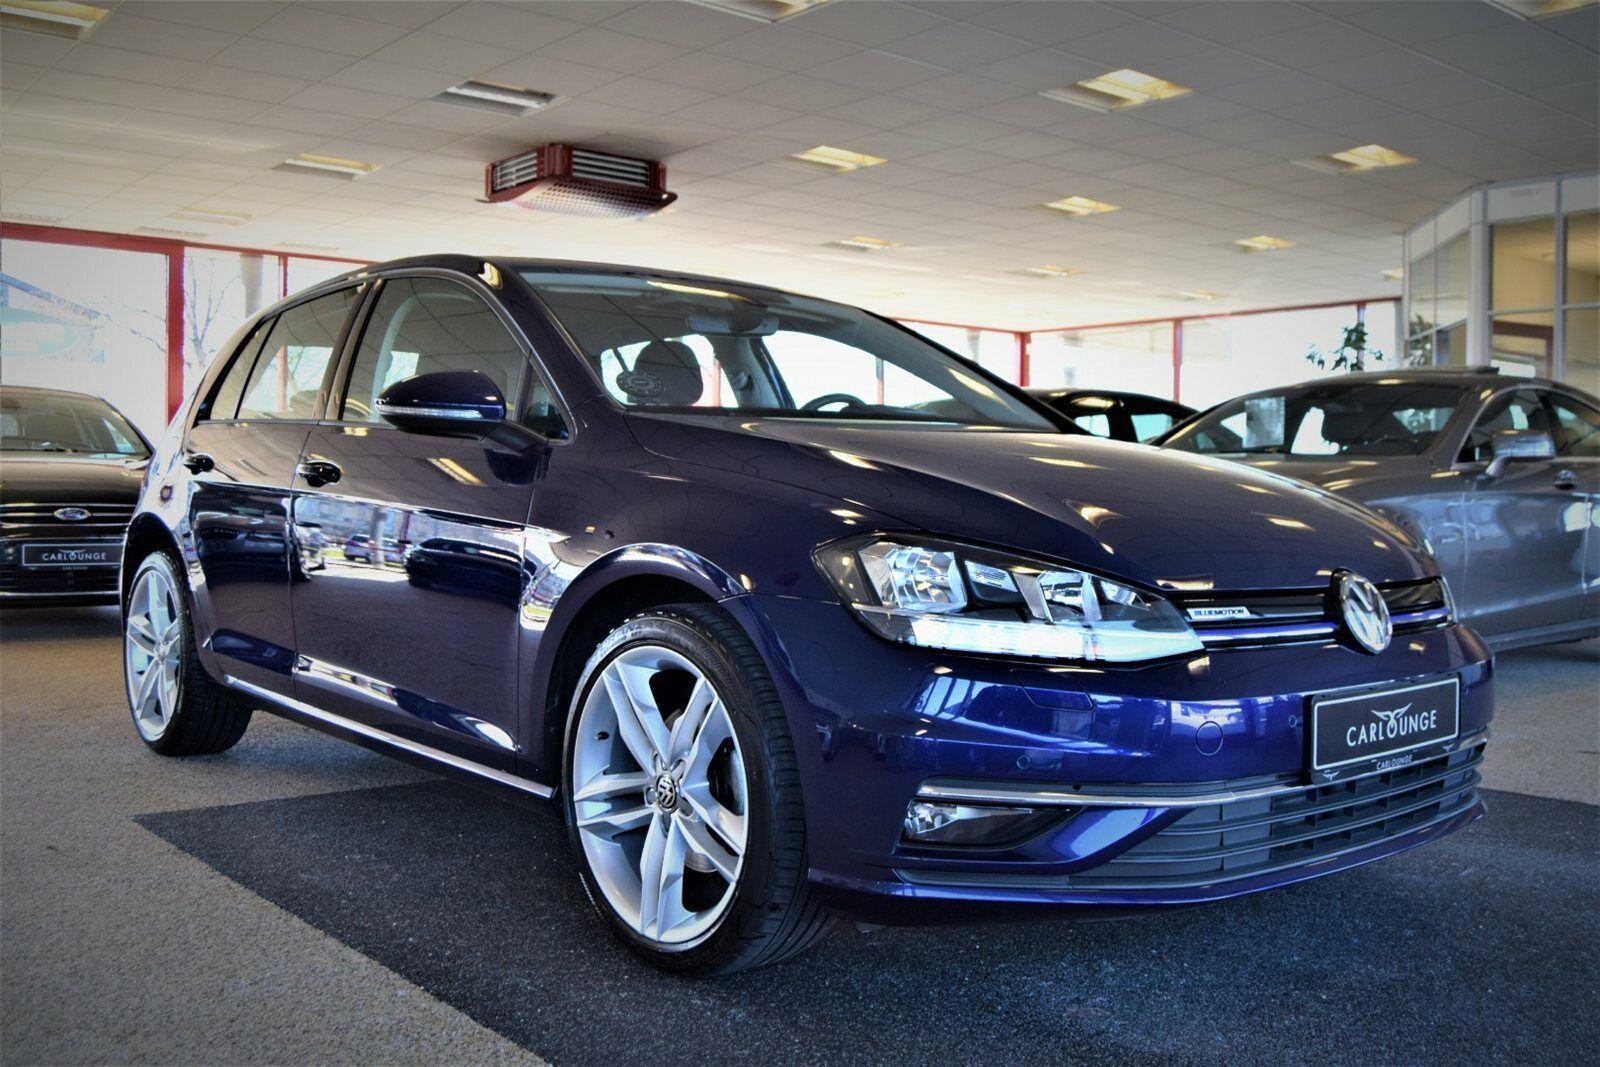 VW Golf VII 1,5 TSi 130 Comfortline 5d - 229.900 kr.